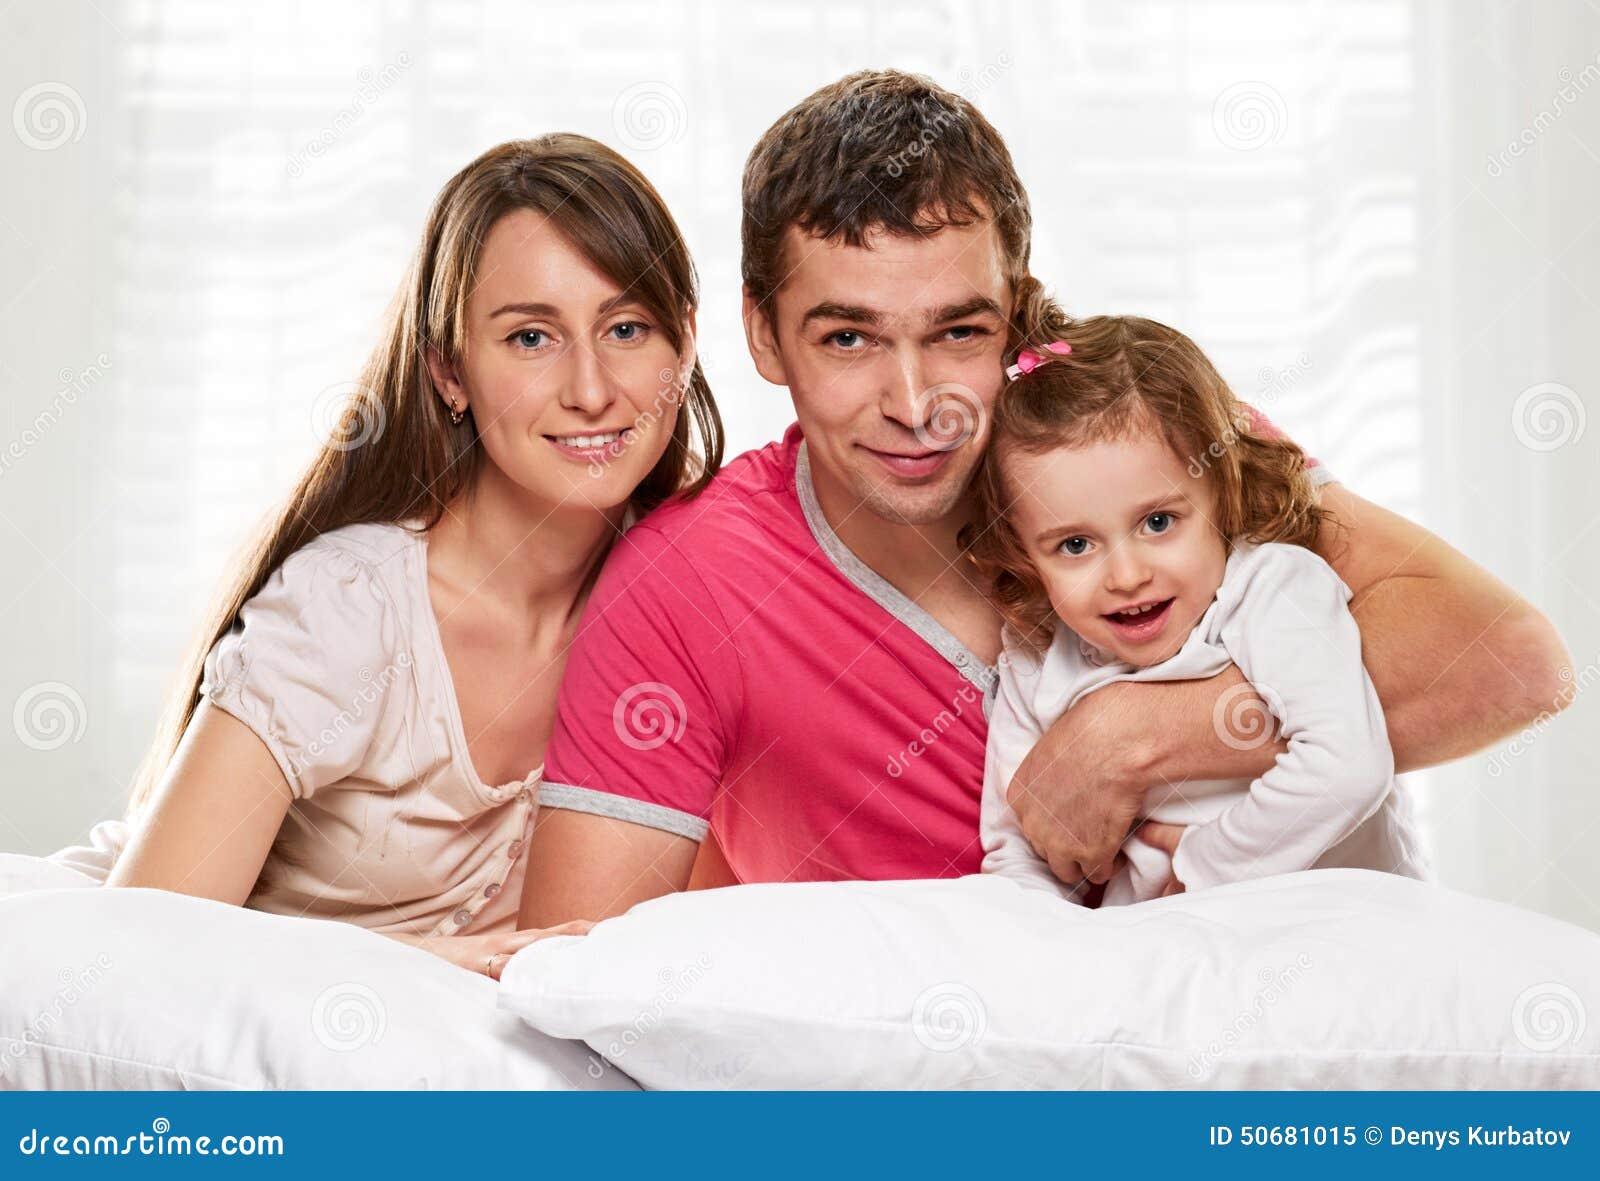 Download 系列系列幸福愉快许多我的投资组合 库存图片. 图片 包括有 使用, 女性, 是的, 父亲, 作用, 母亲 - 50681015